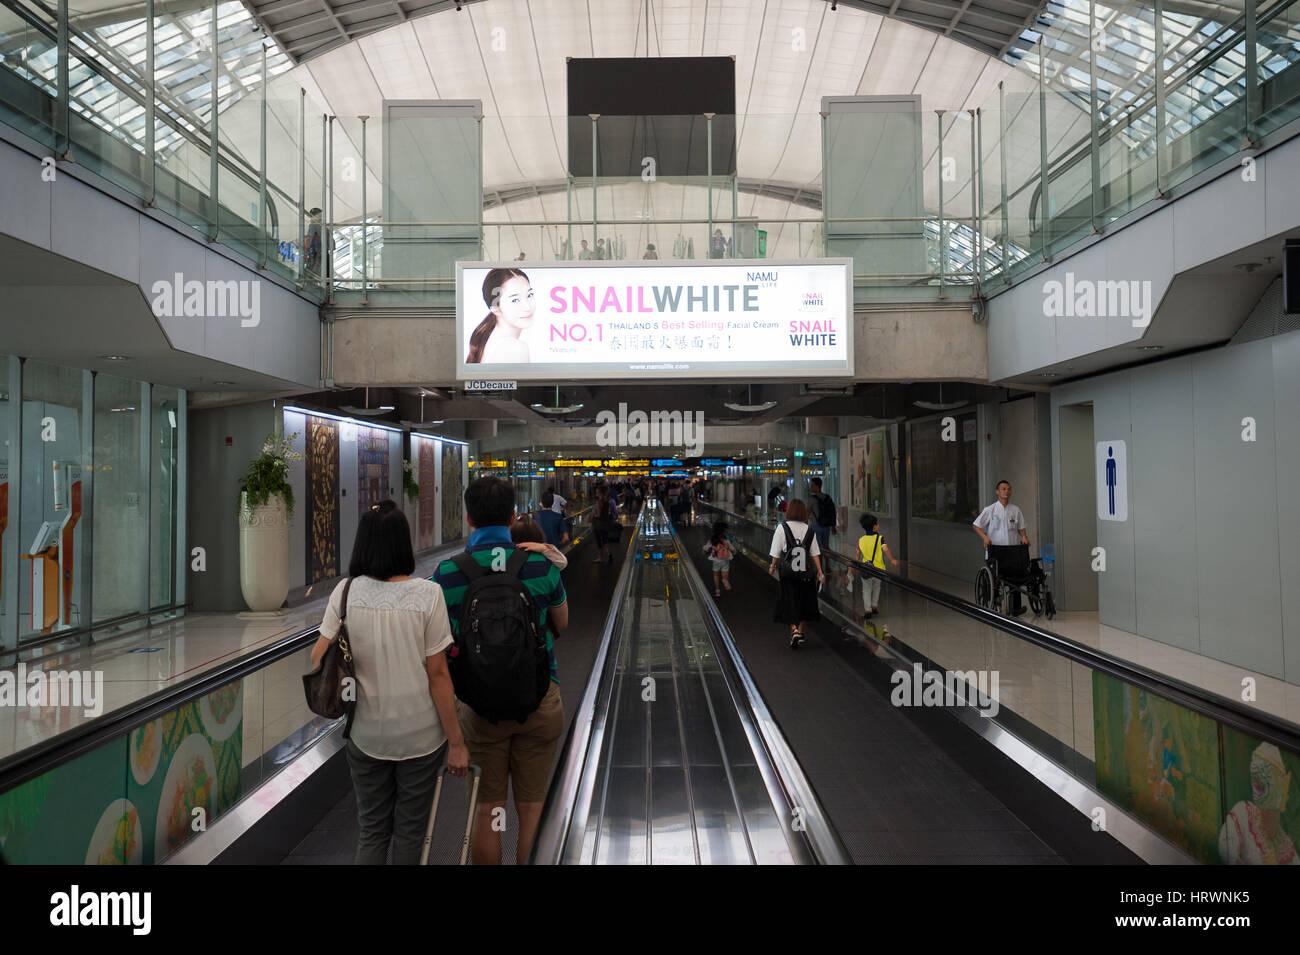 25.01.2017, Bangkok, Thailand, Asia - A view inside the arrival area at Bangkok's Suvarnabhumi Airport. - Stock Image